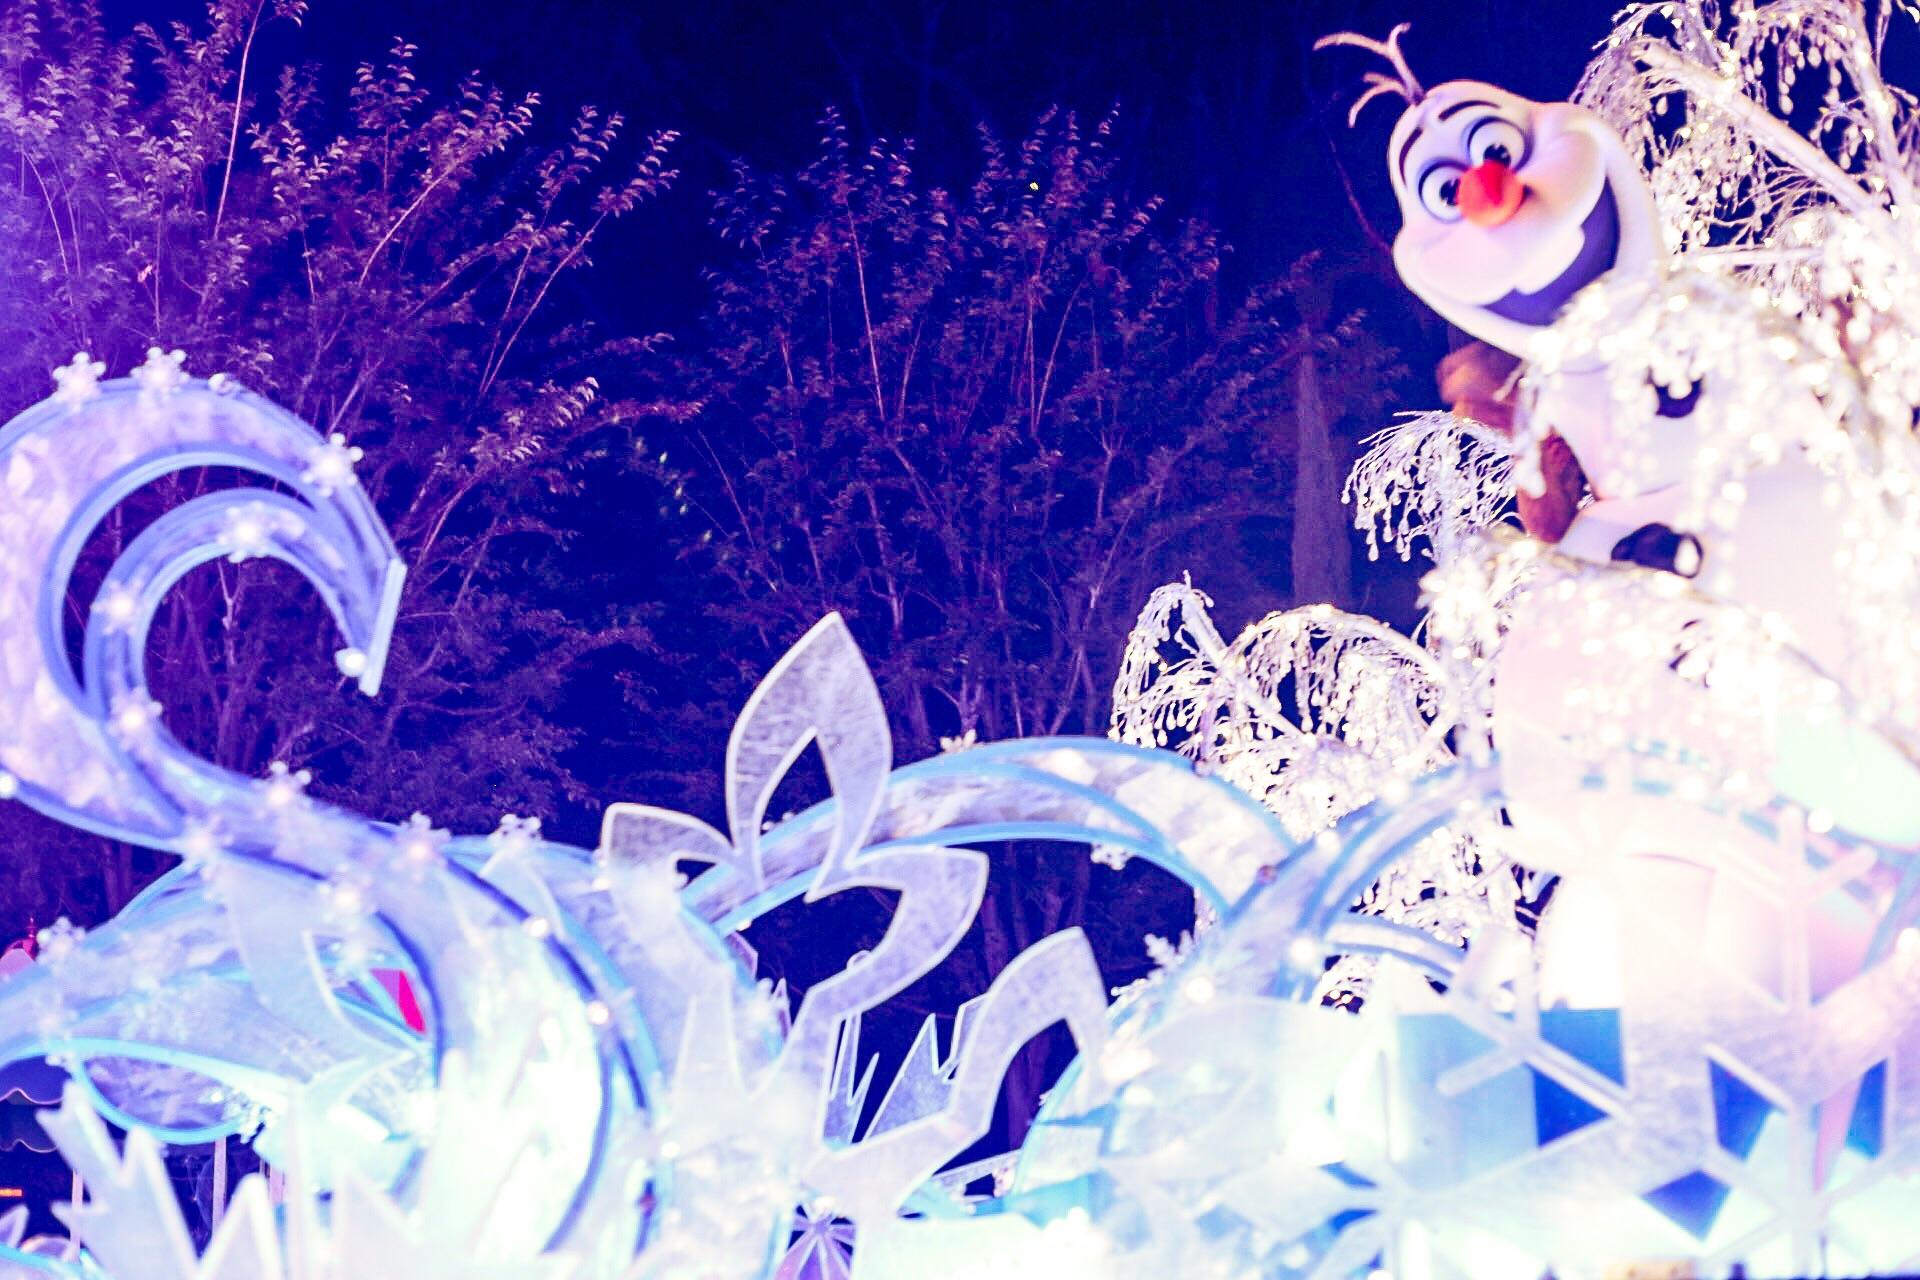 Olaf! Photo Credit: Audrey Montoya @AudreyMontoya